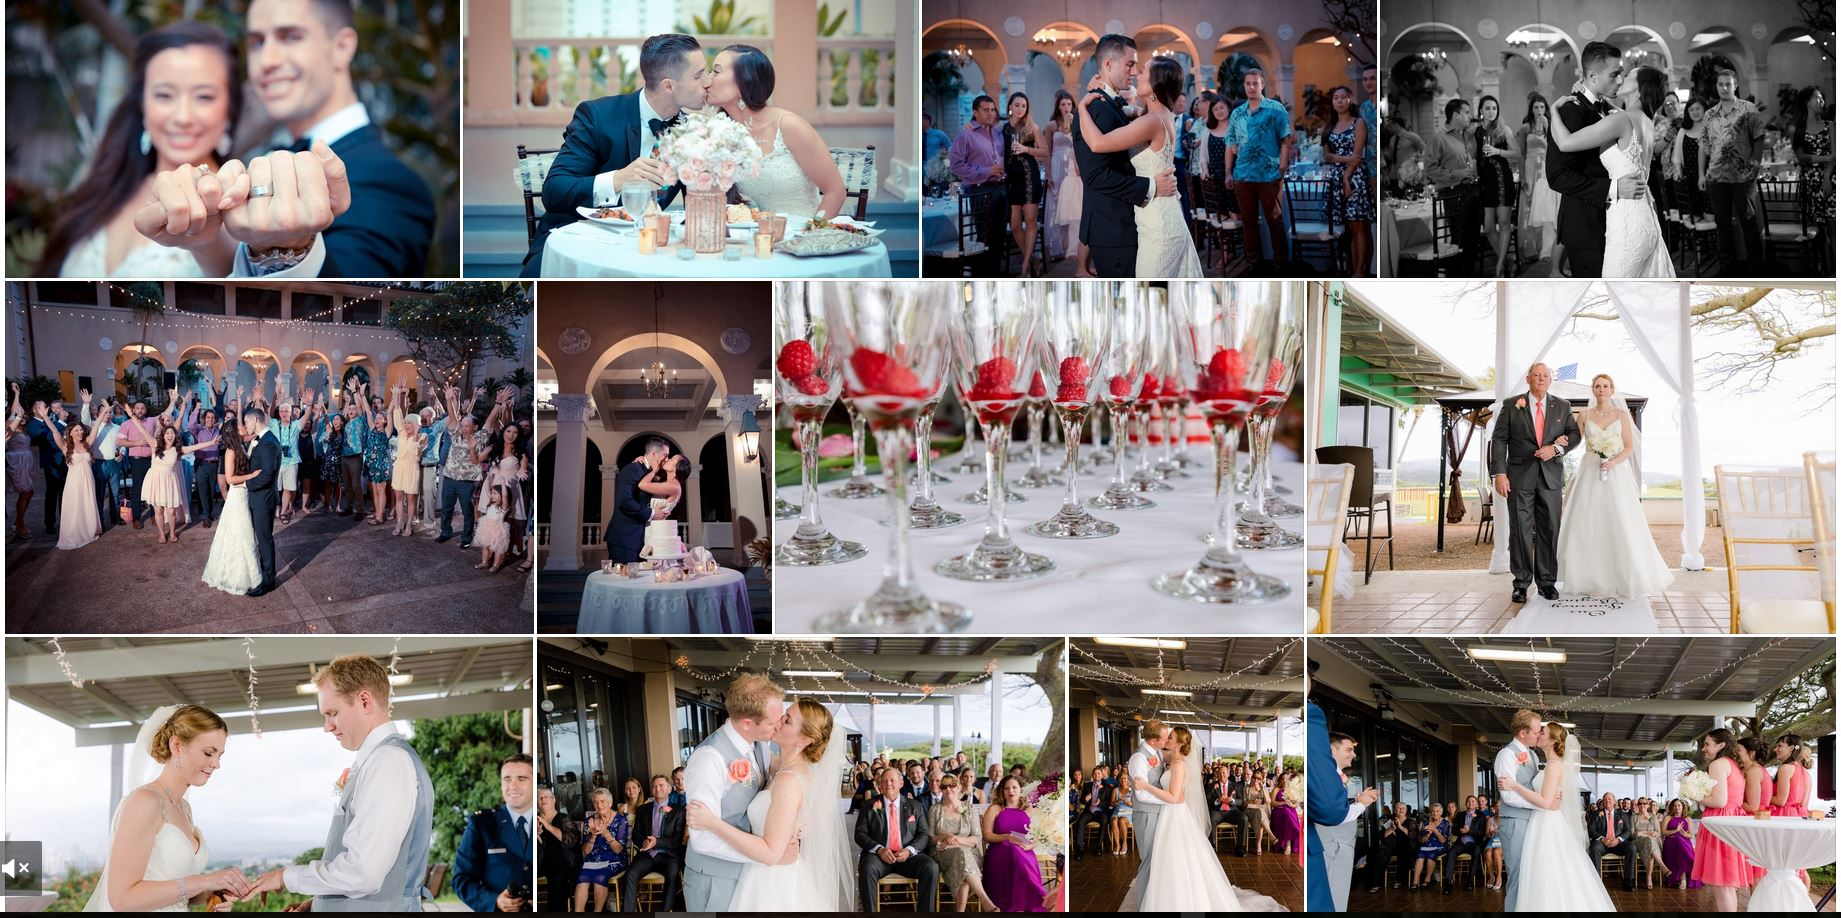 wedding photos gallery